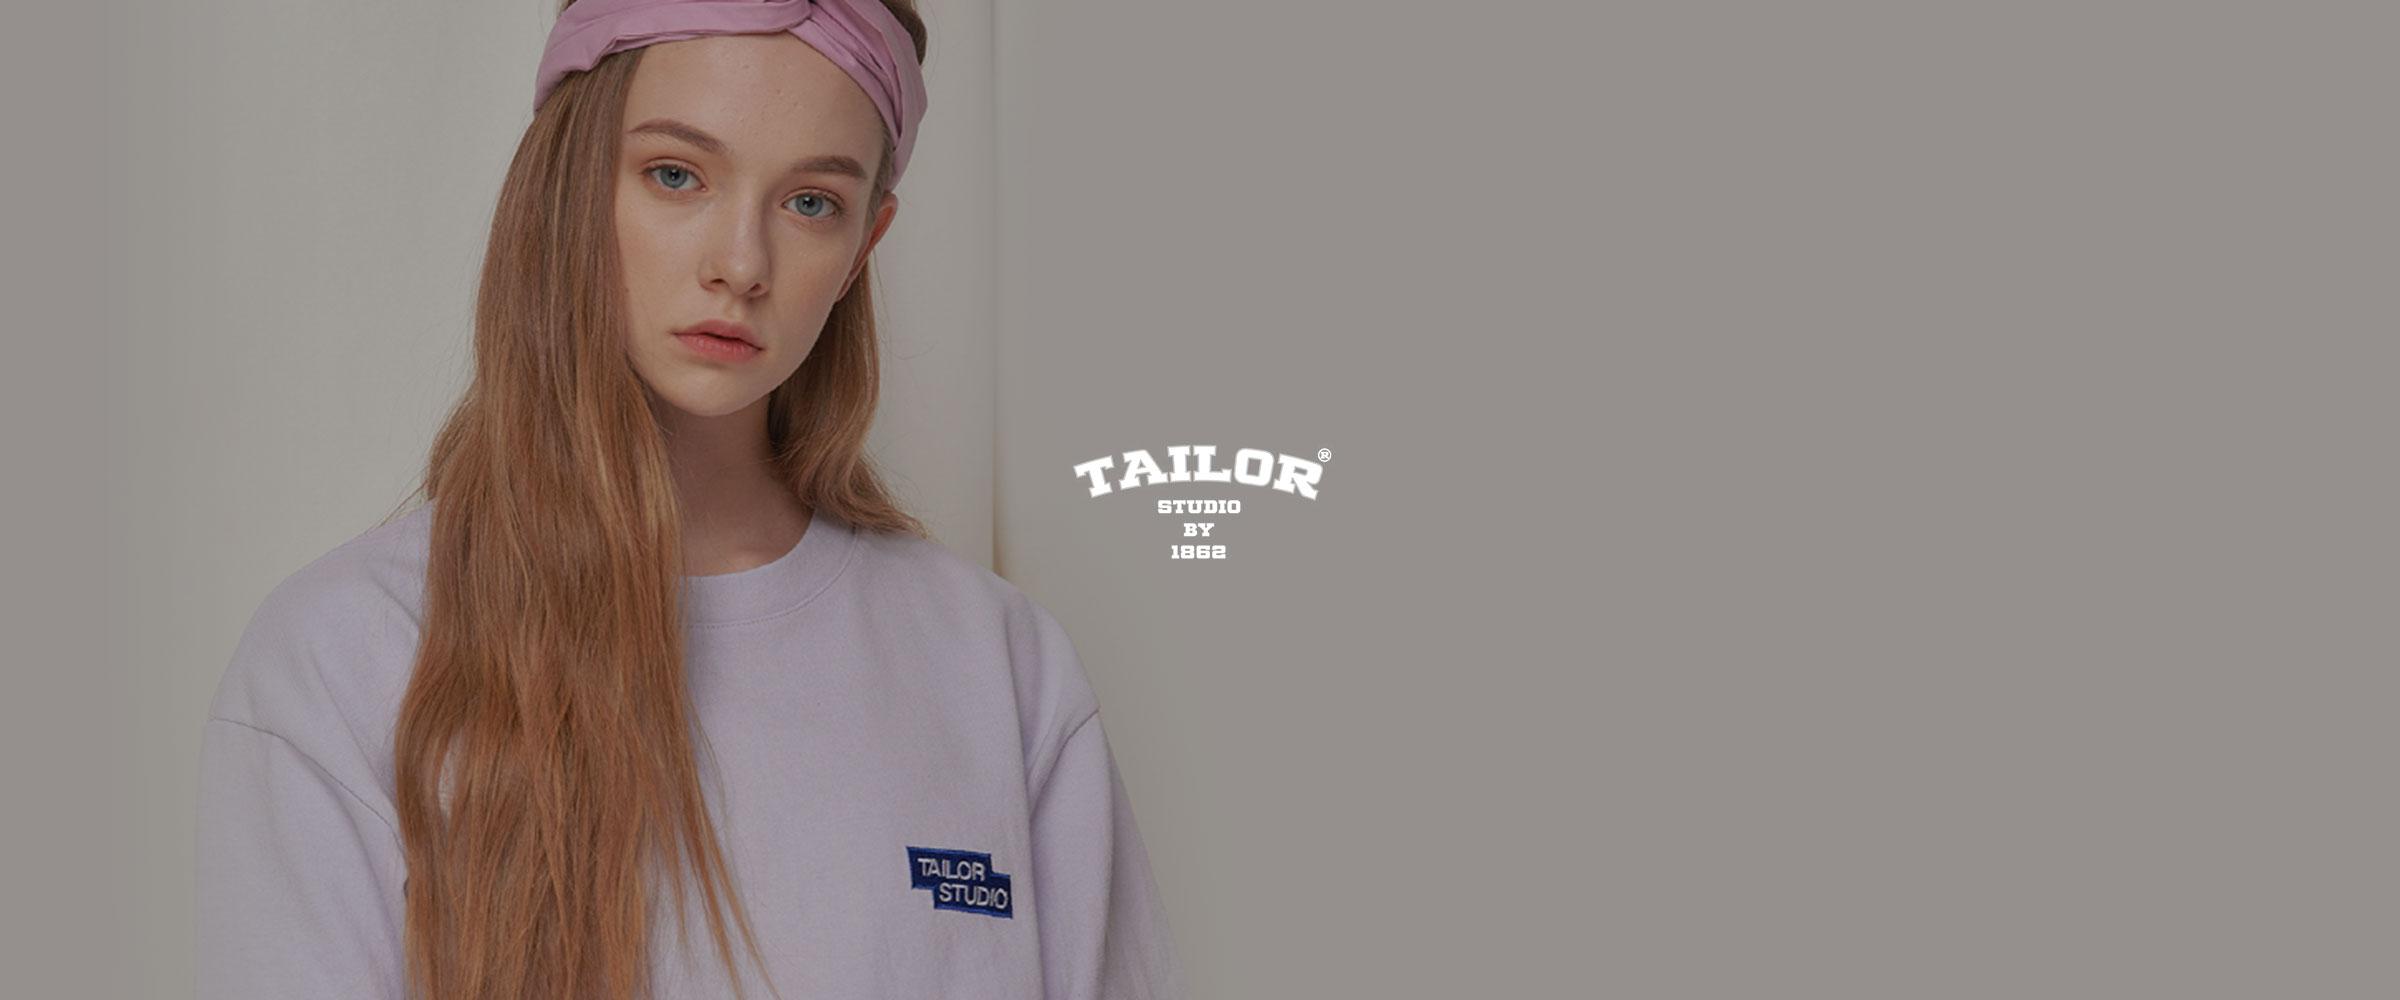 tailorstudio.jpg